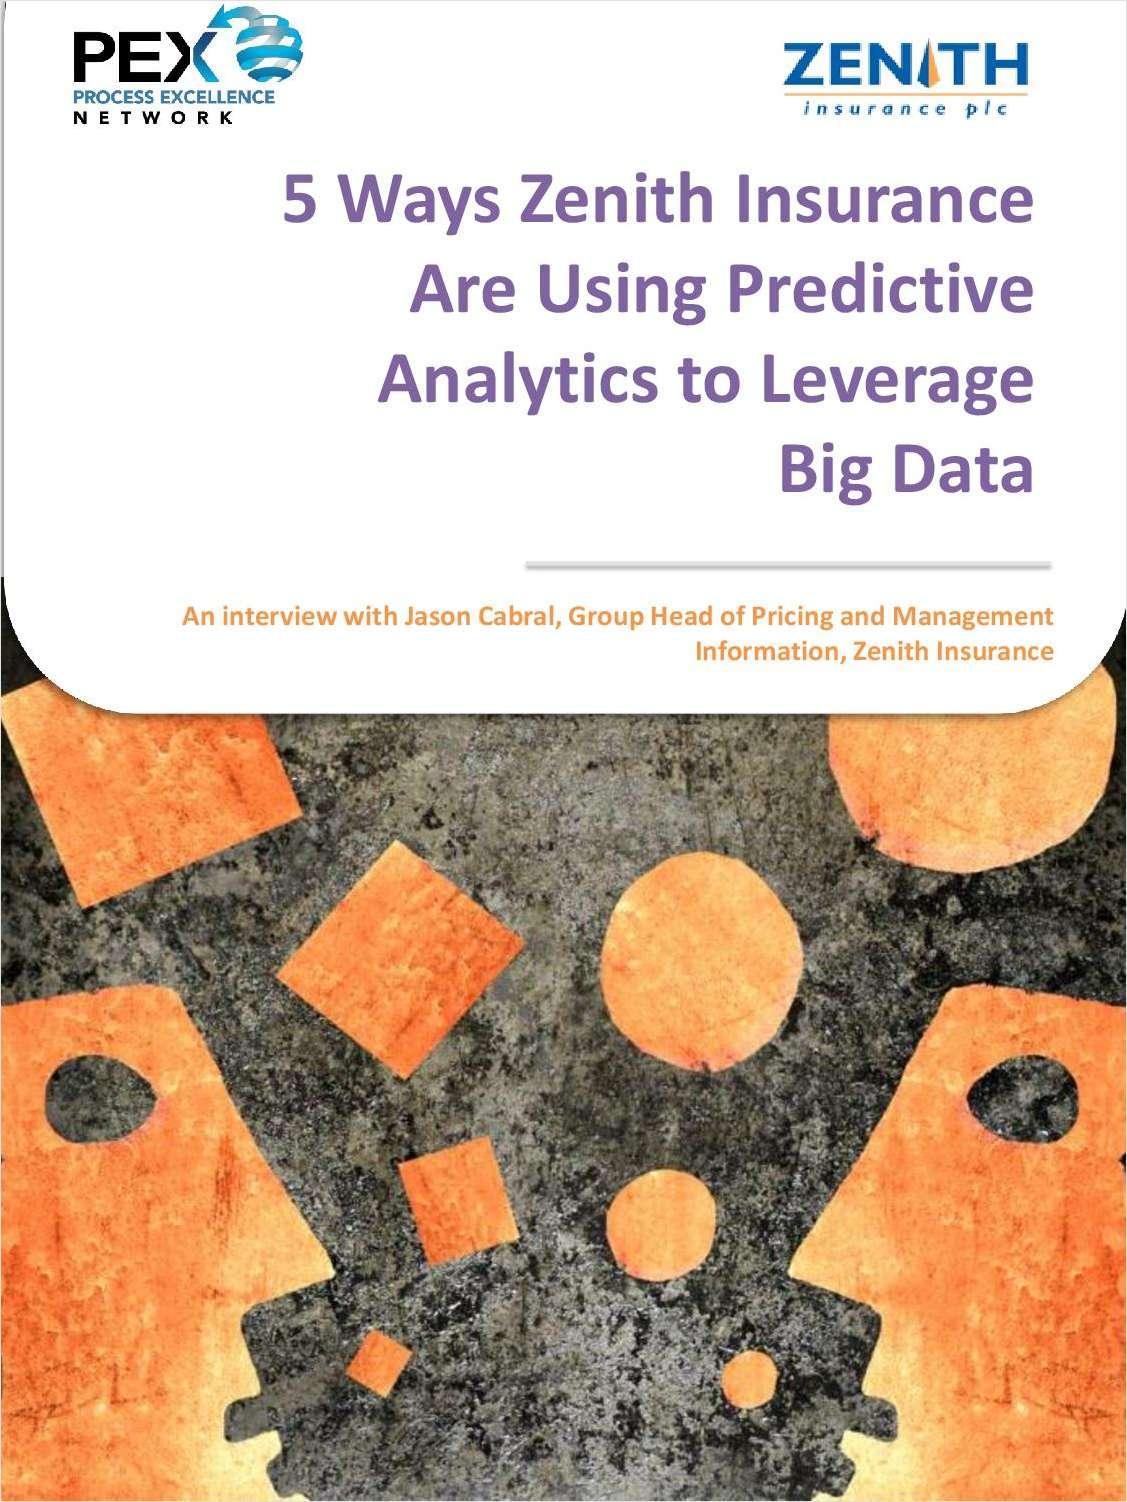 5 Ways Zenith Insurance Are Using Predictive Analytics to Leverage Big Data